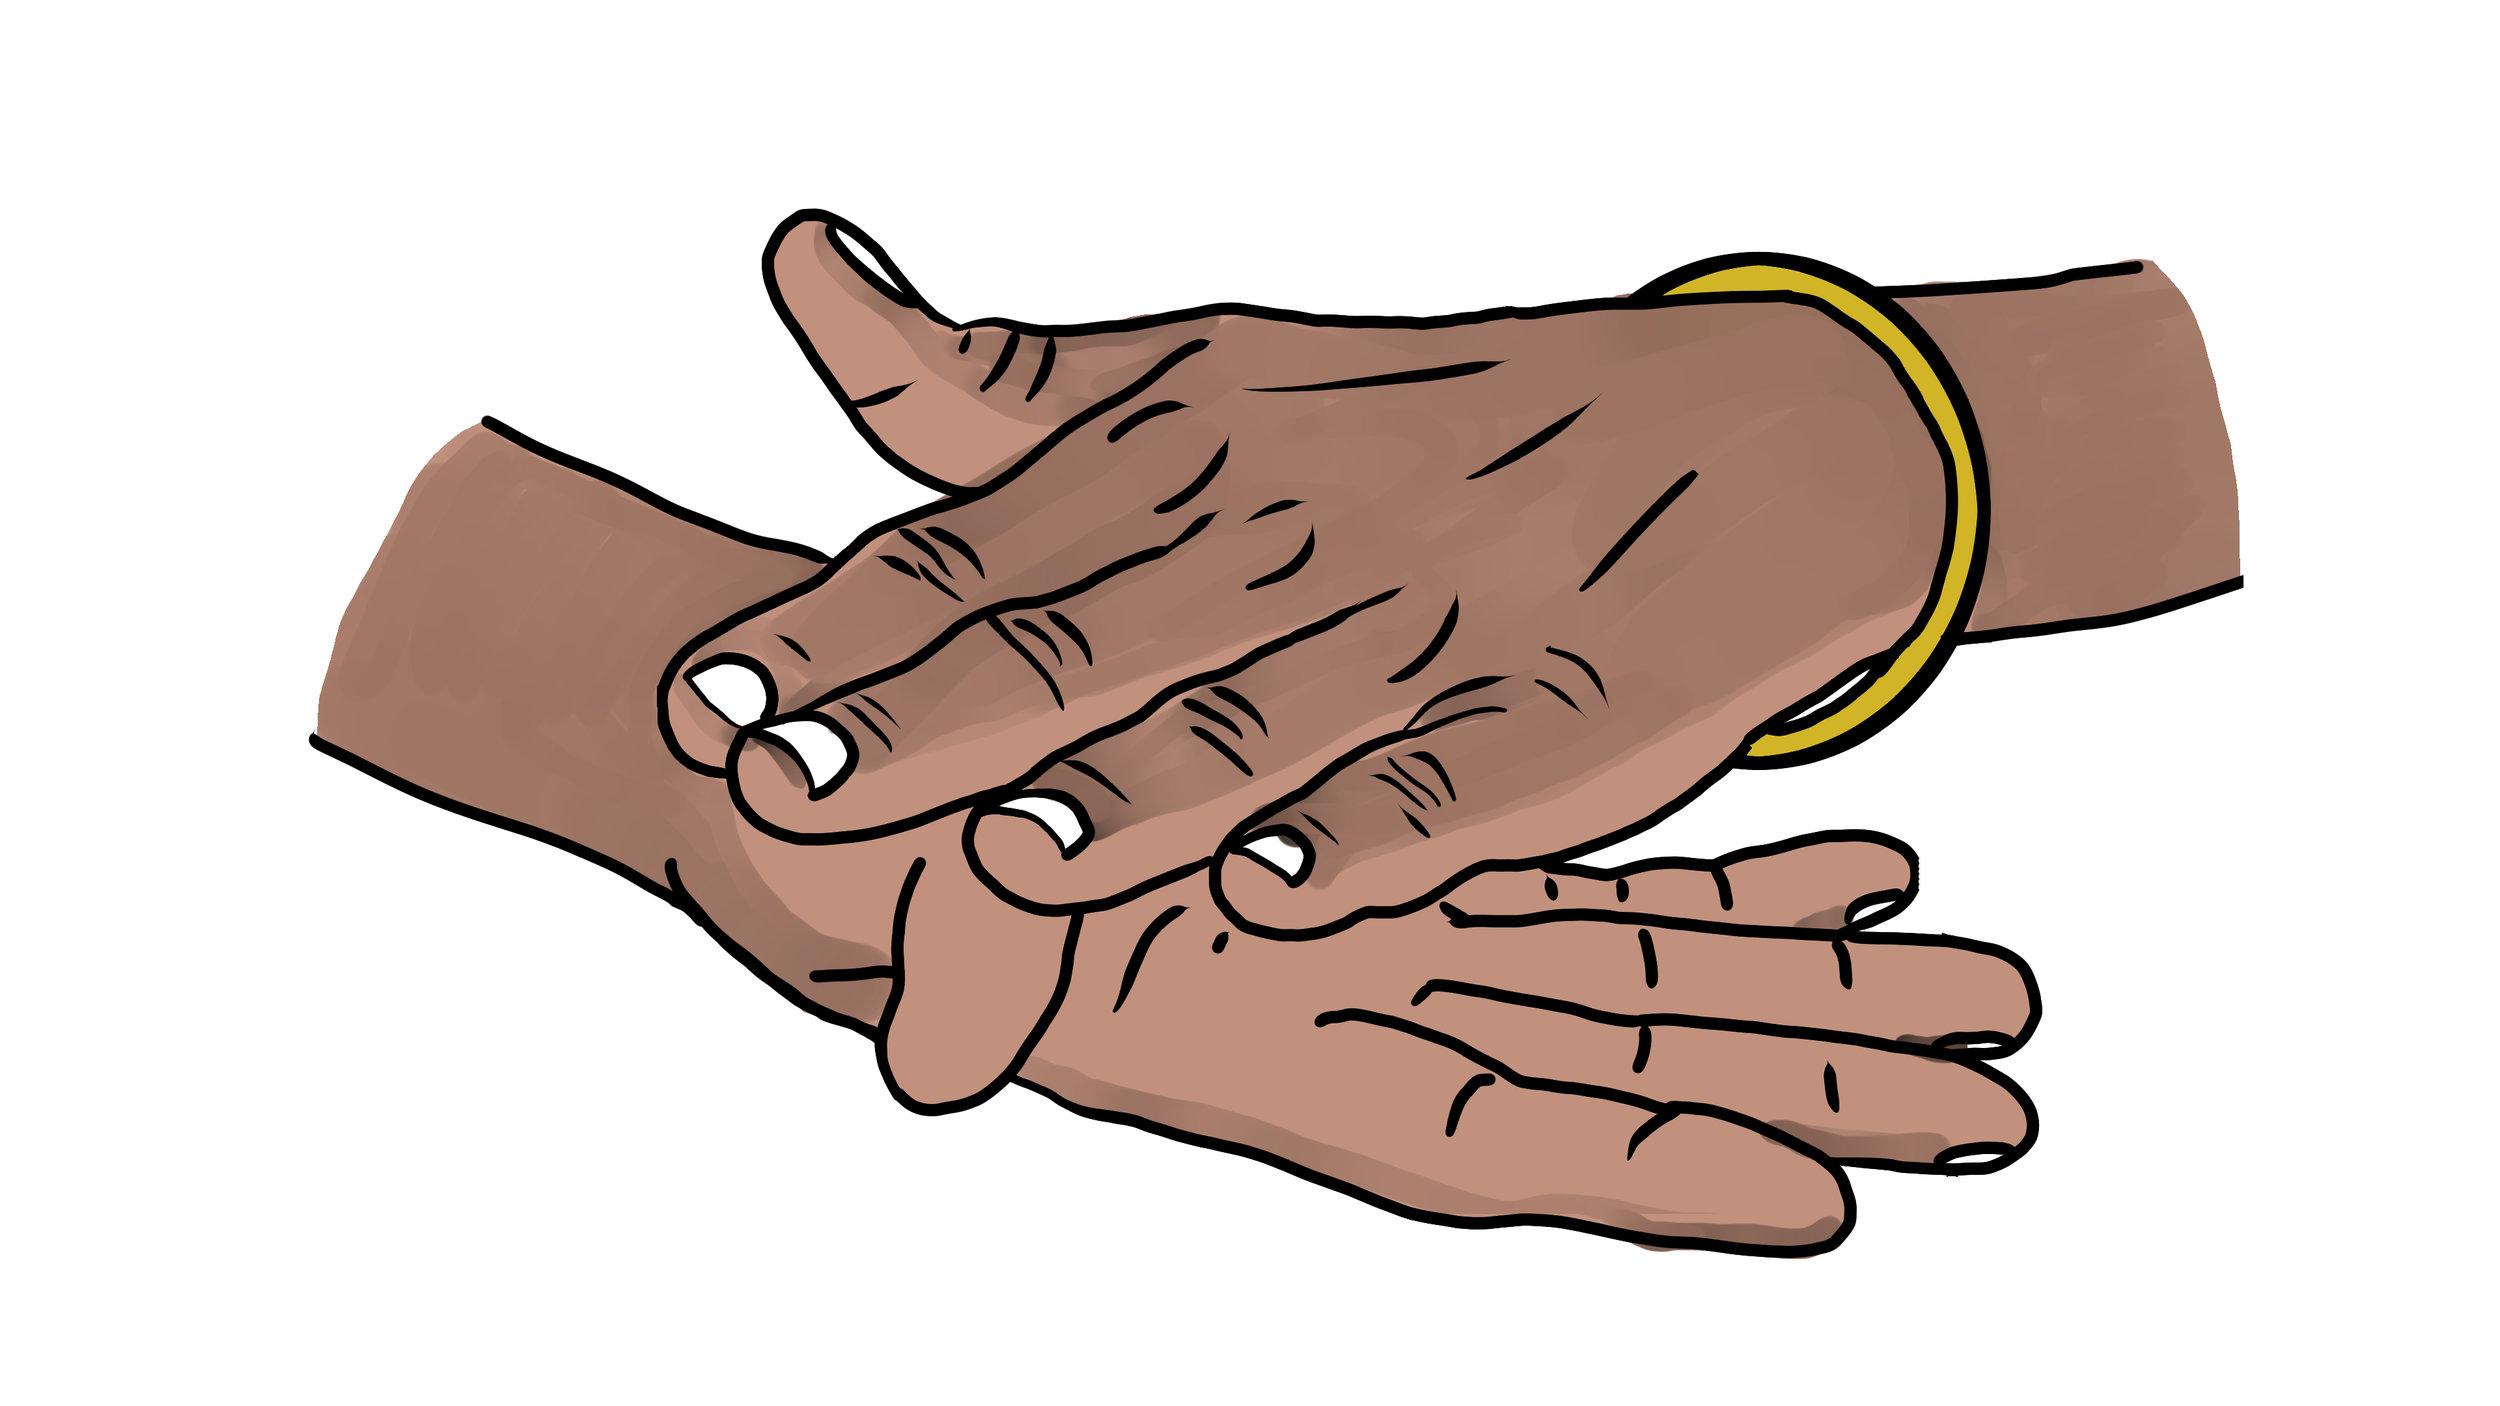 hand clap, clapping hands, yoruba, orisha, moyugba, mojuba, bata drumming, tambores bata, ibaebayentonu